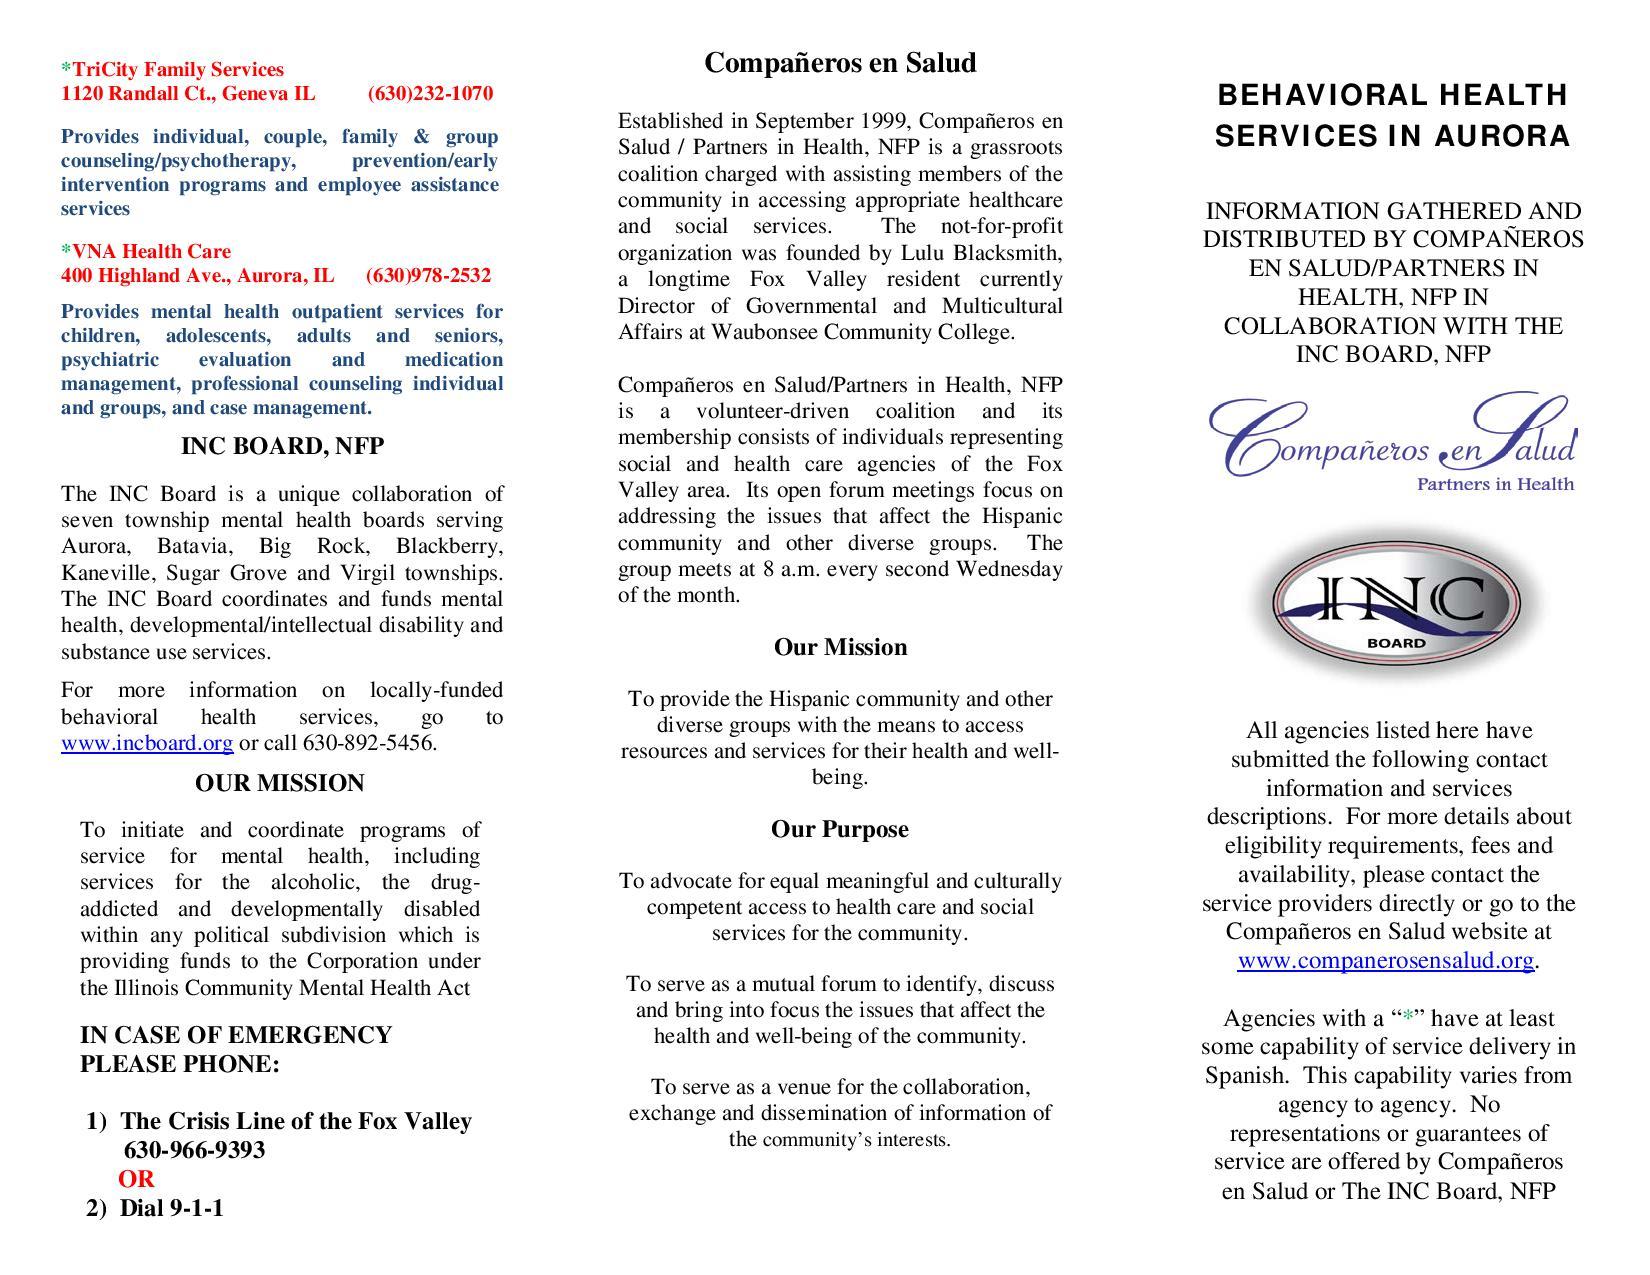 Mental Health Brochure